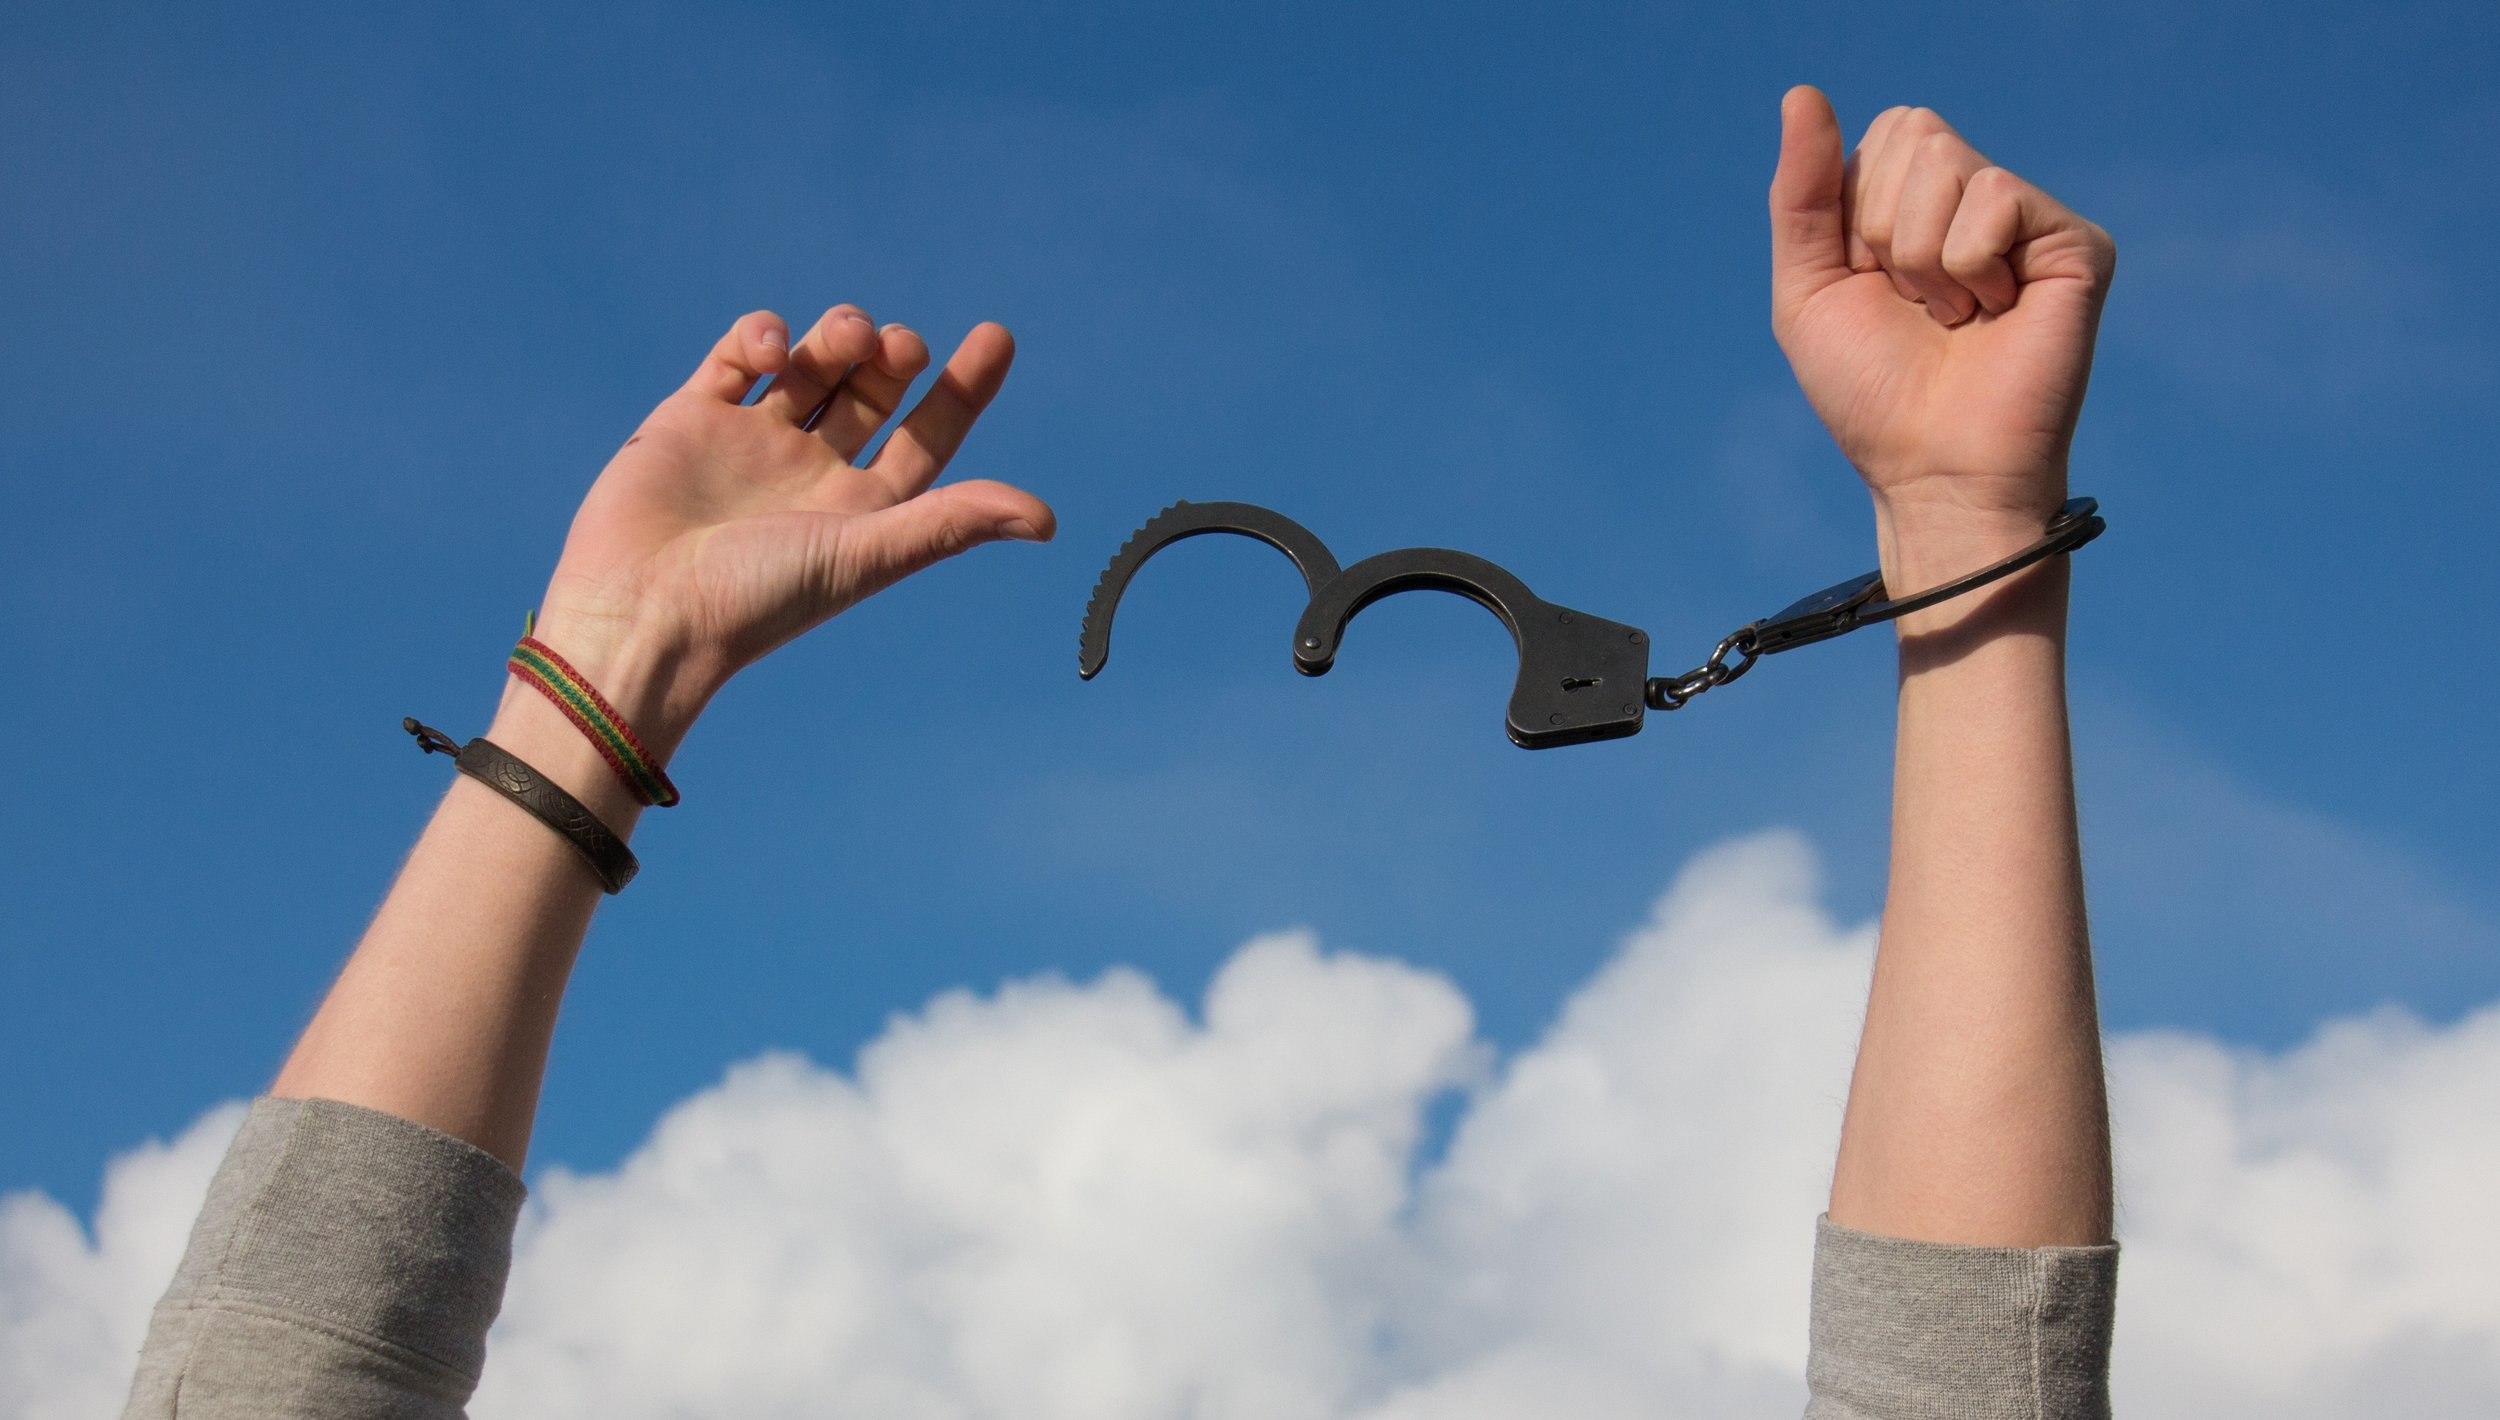 freedom-handcuffs-hands-247851 (1).jpg